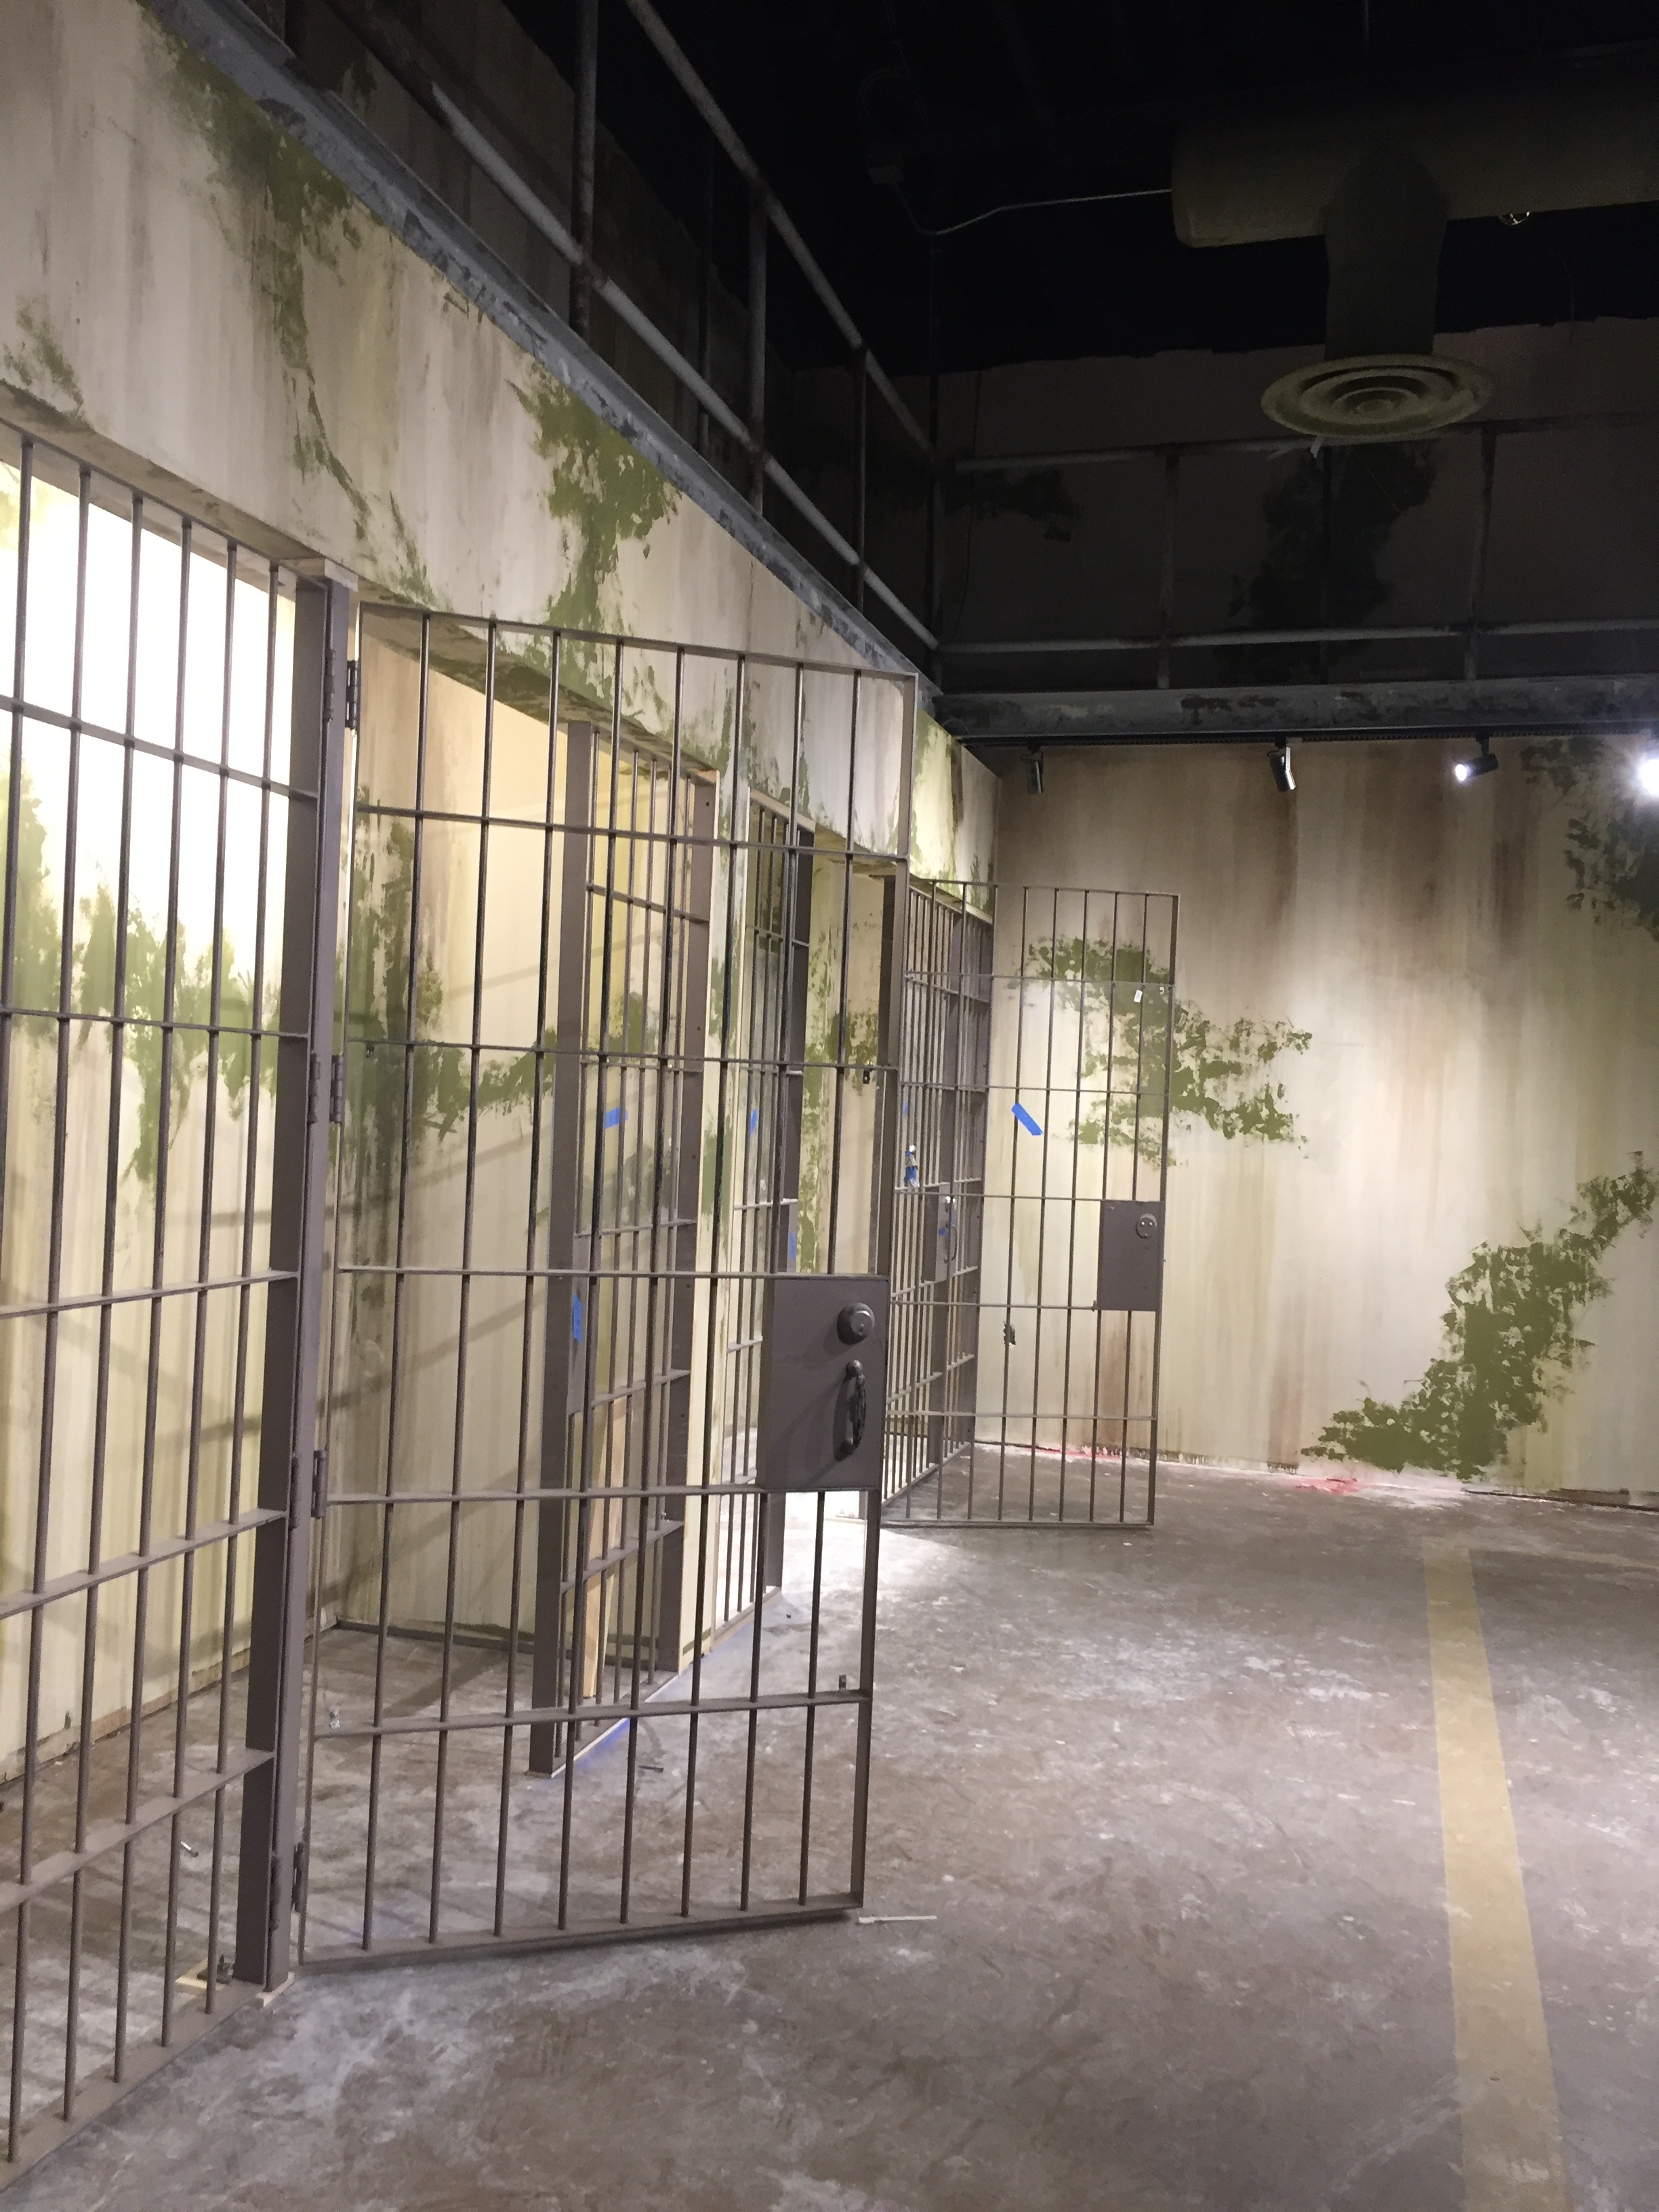 Alcatraz East prison cells in progress.